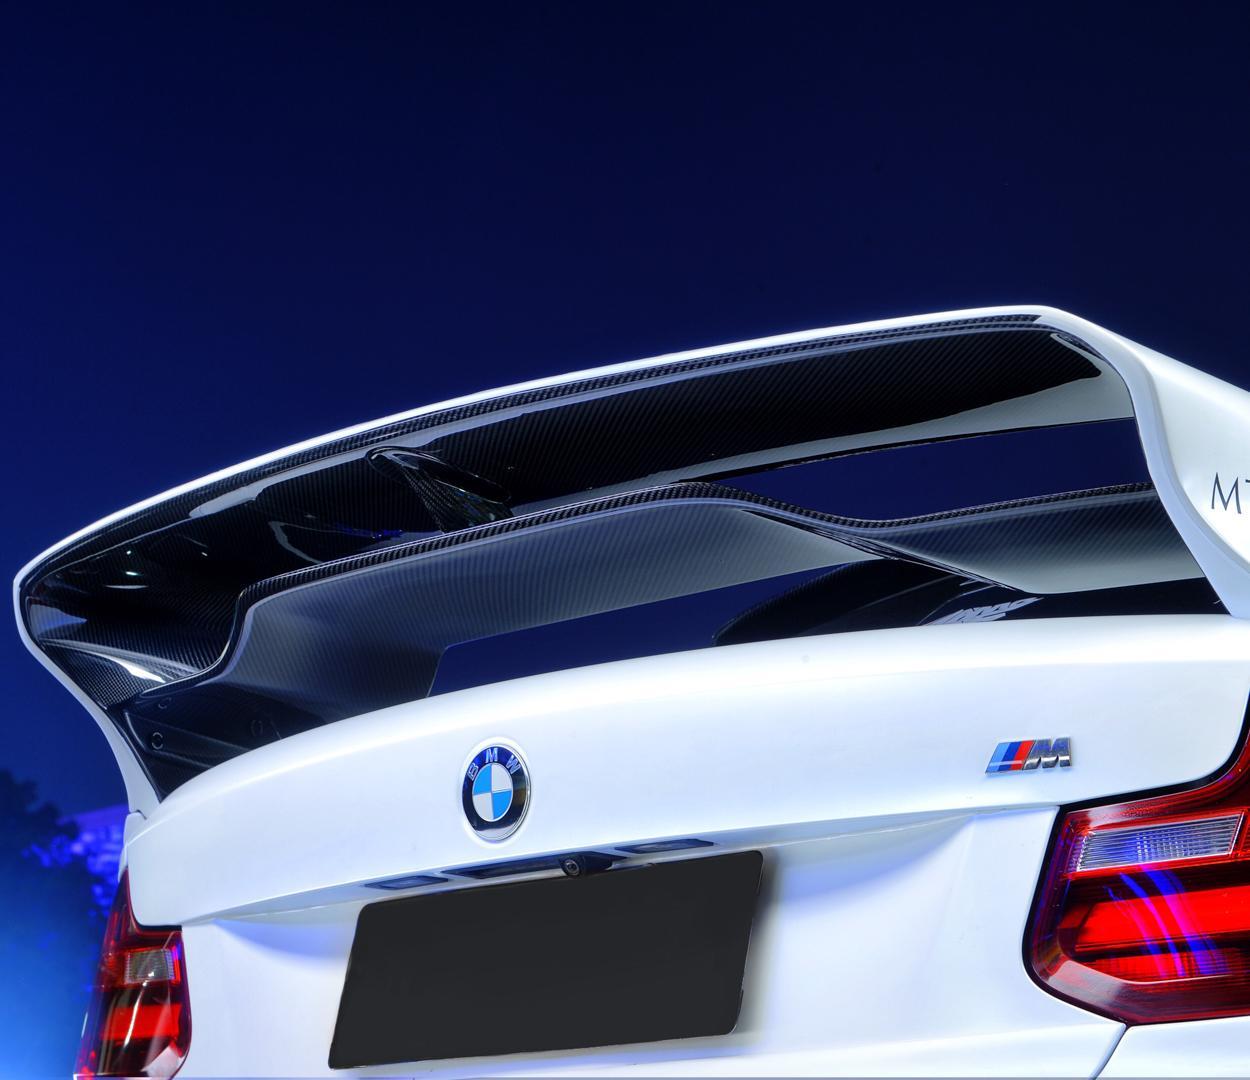 BMW M2 Vision Gran Turismo